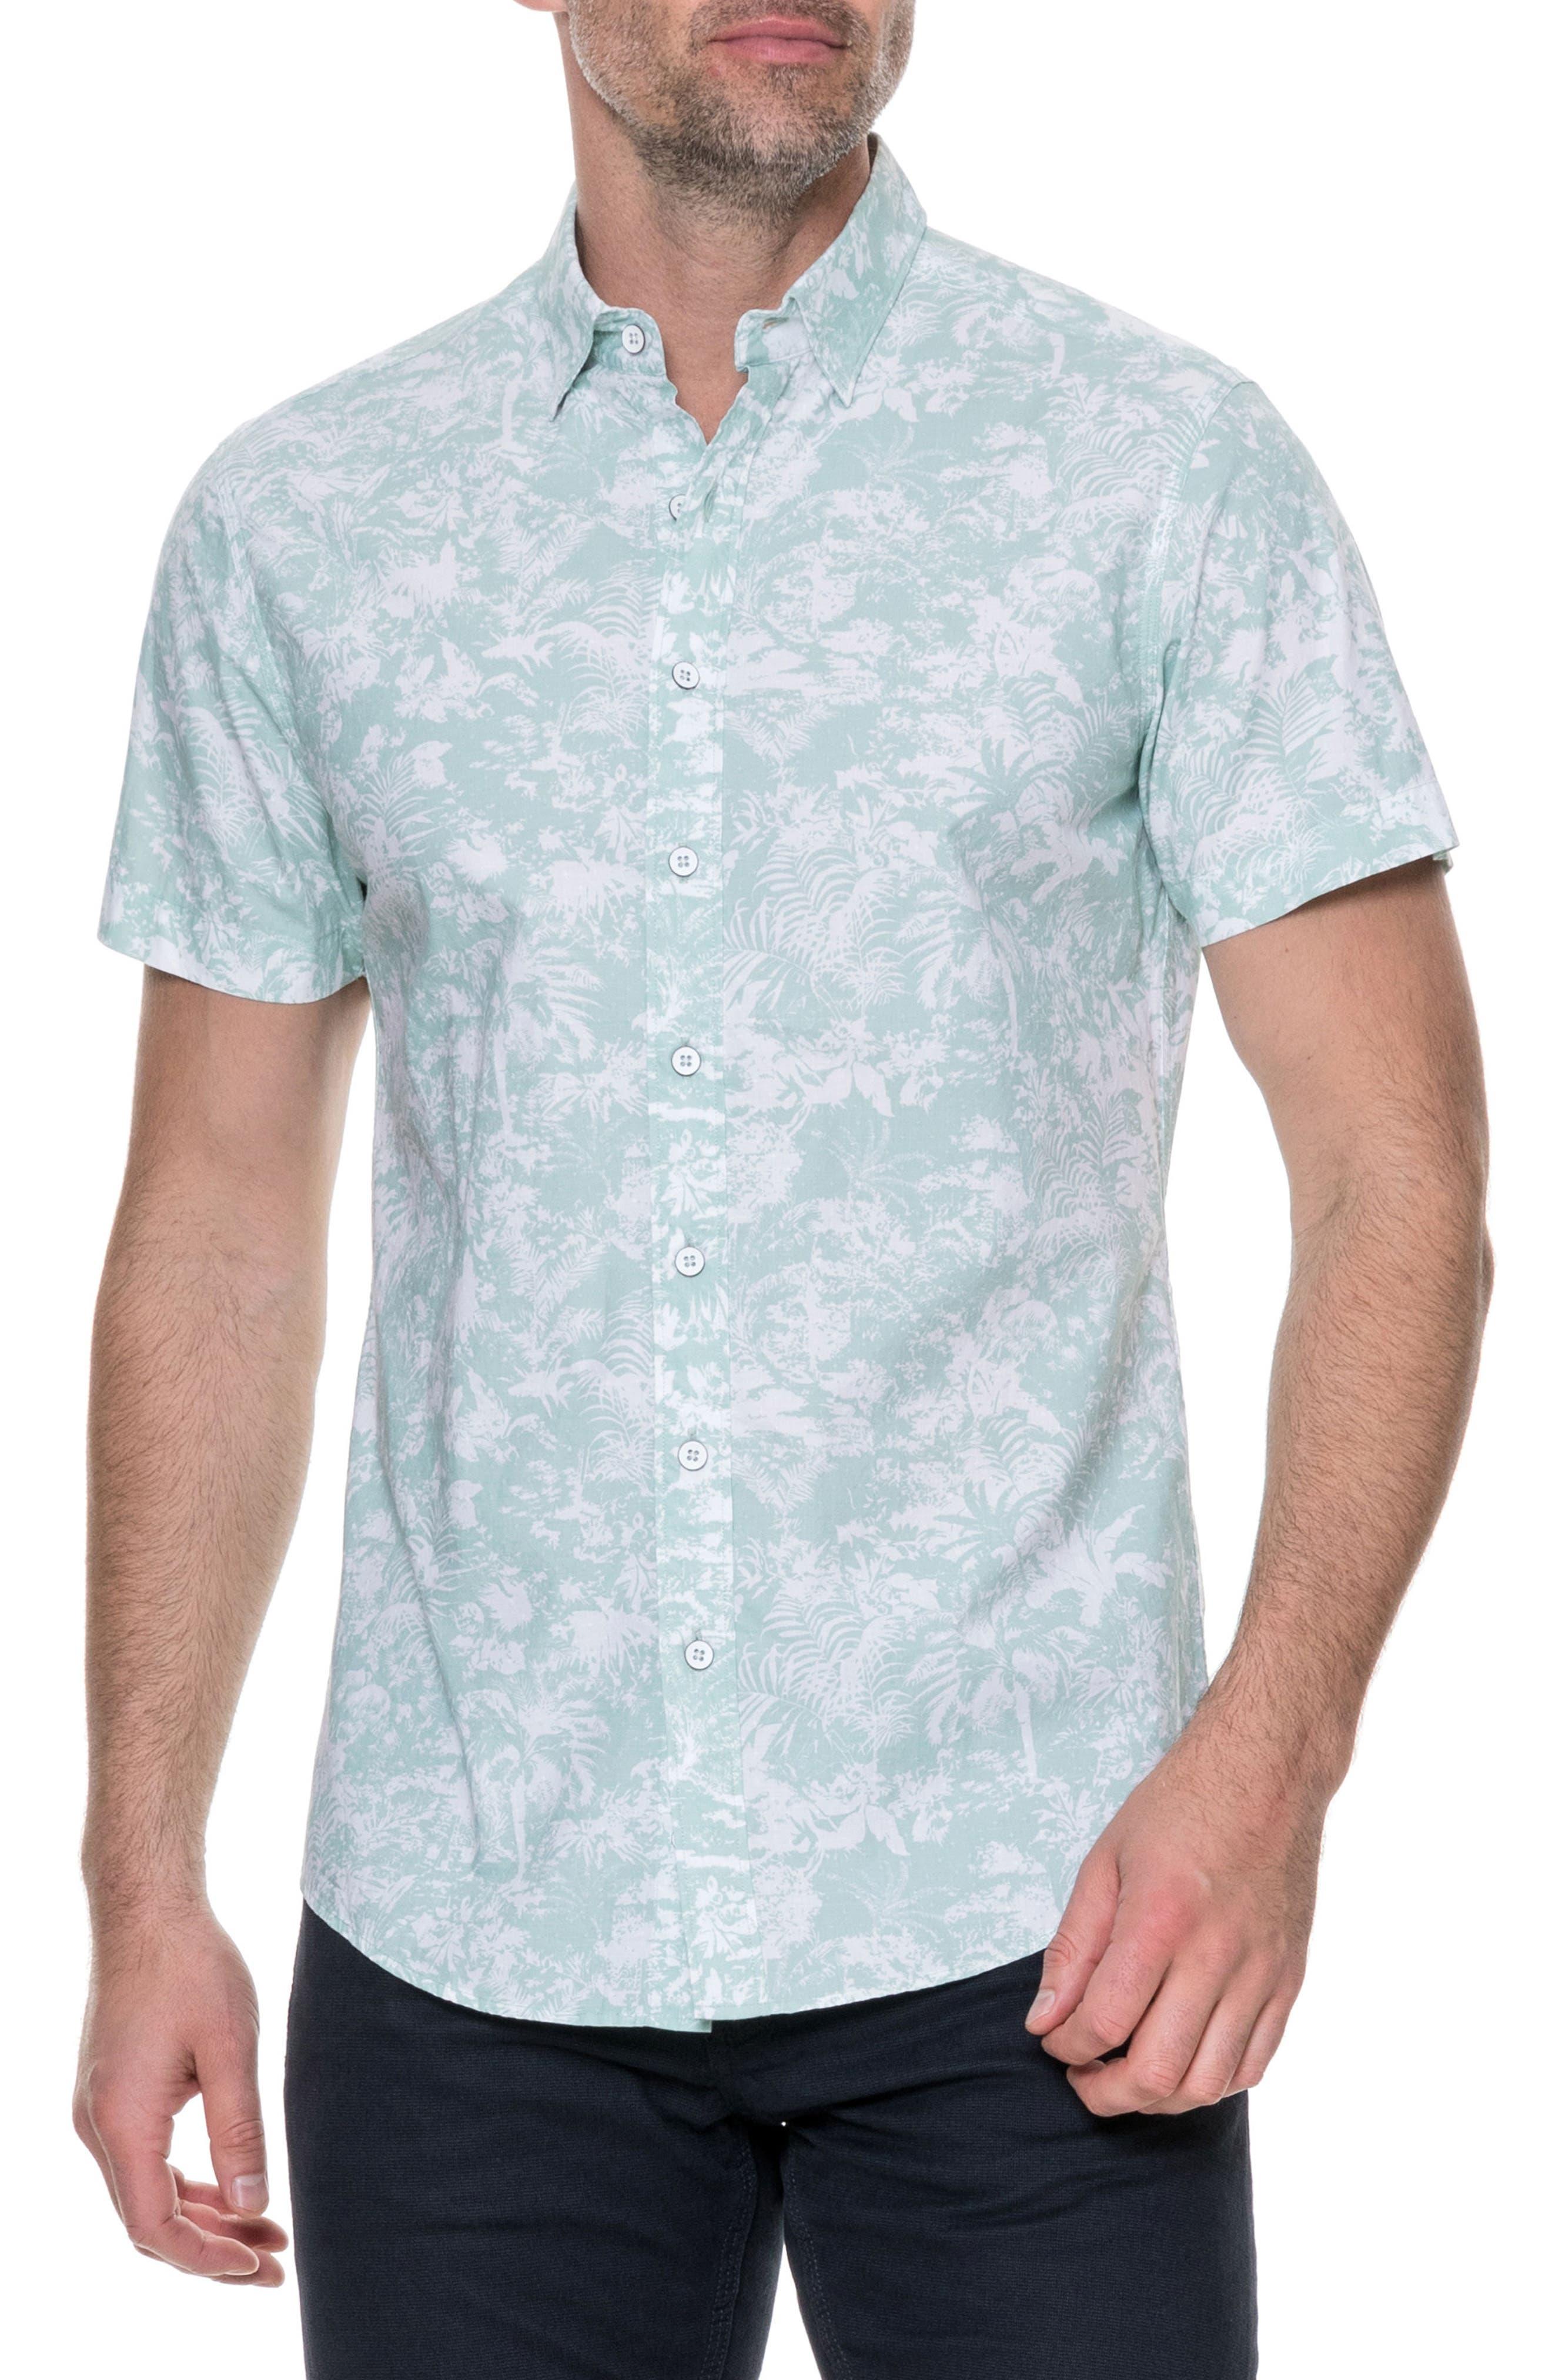 RODD & GUNN,                             Redcastle Regular Fit Sport Shirt,                             Main thumbnail 1, color,                             POWDER BLUE